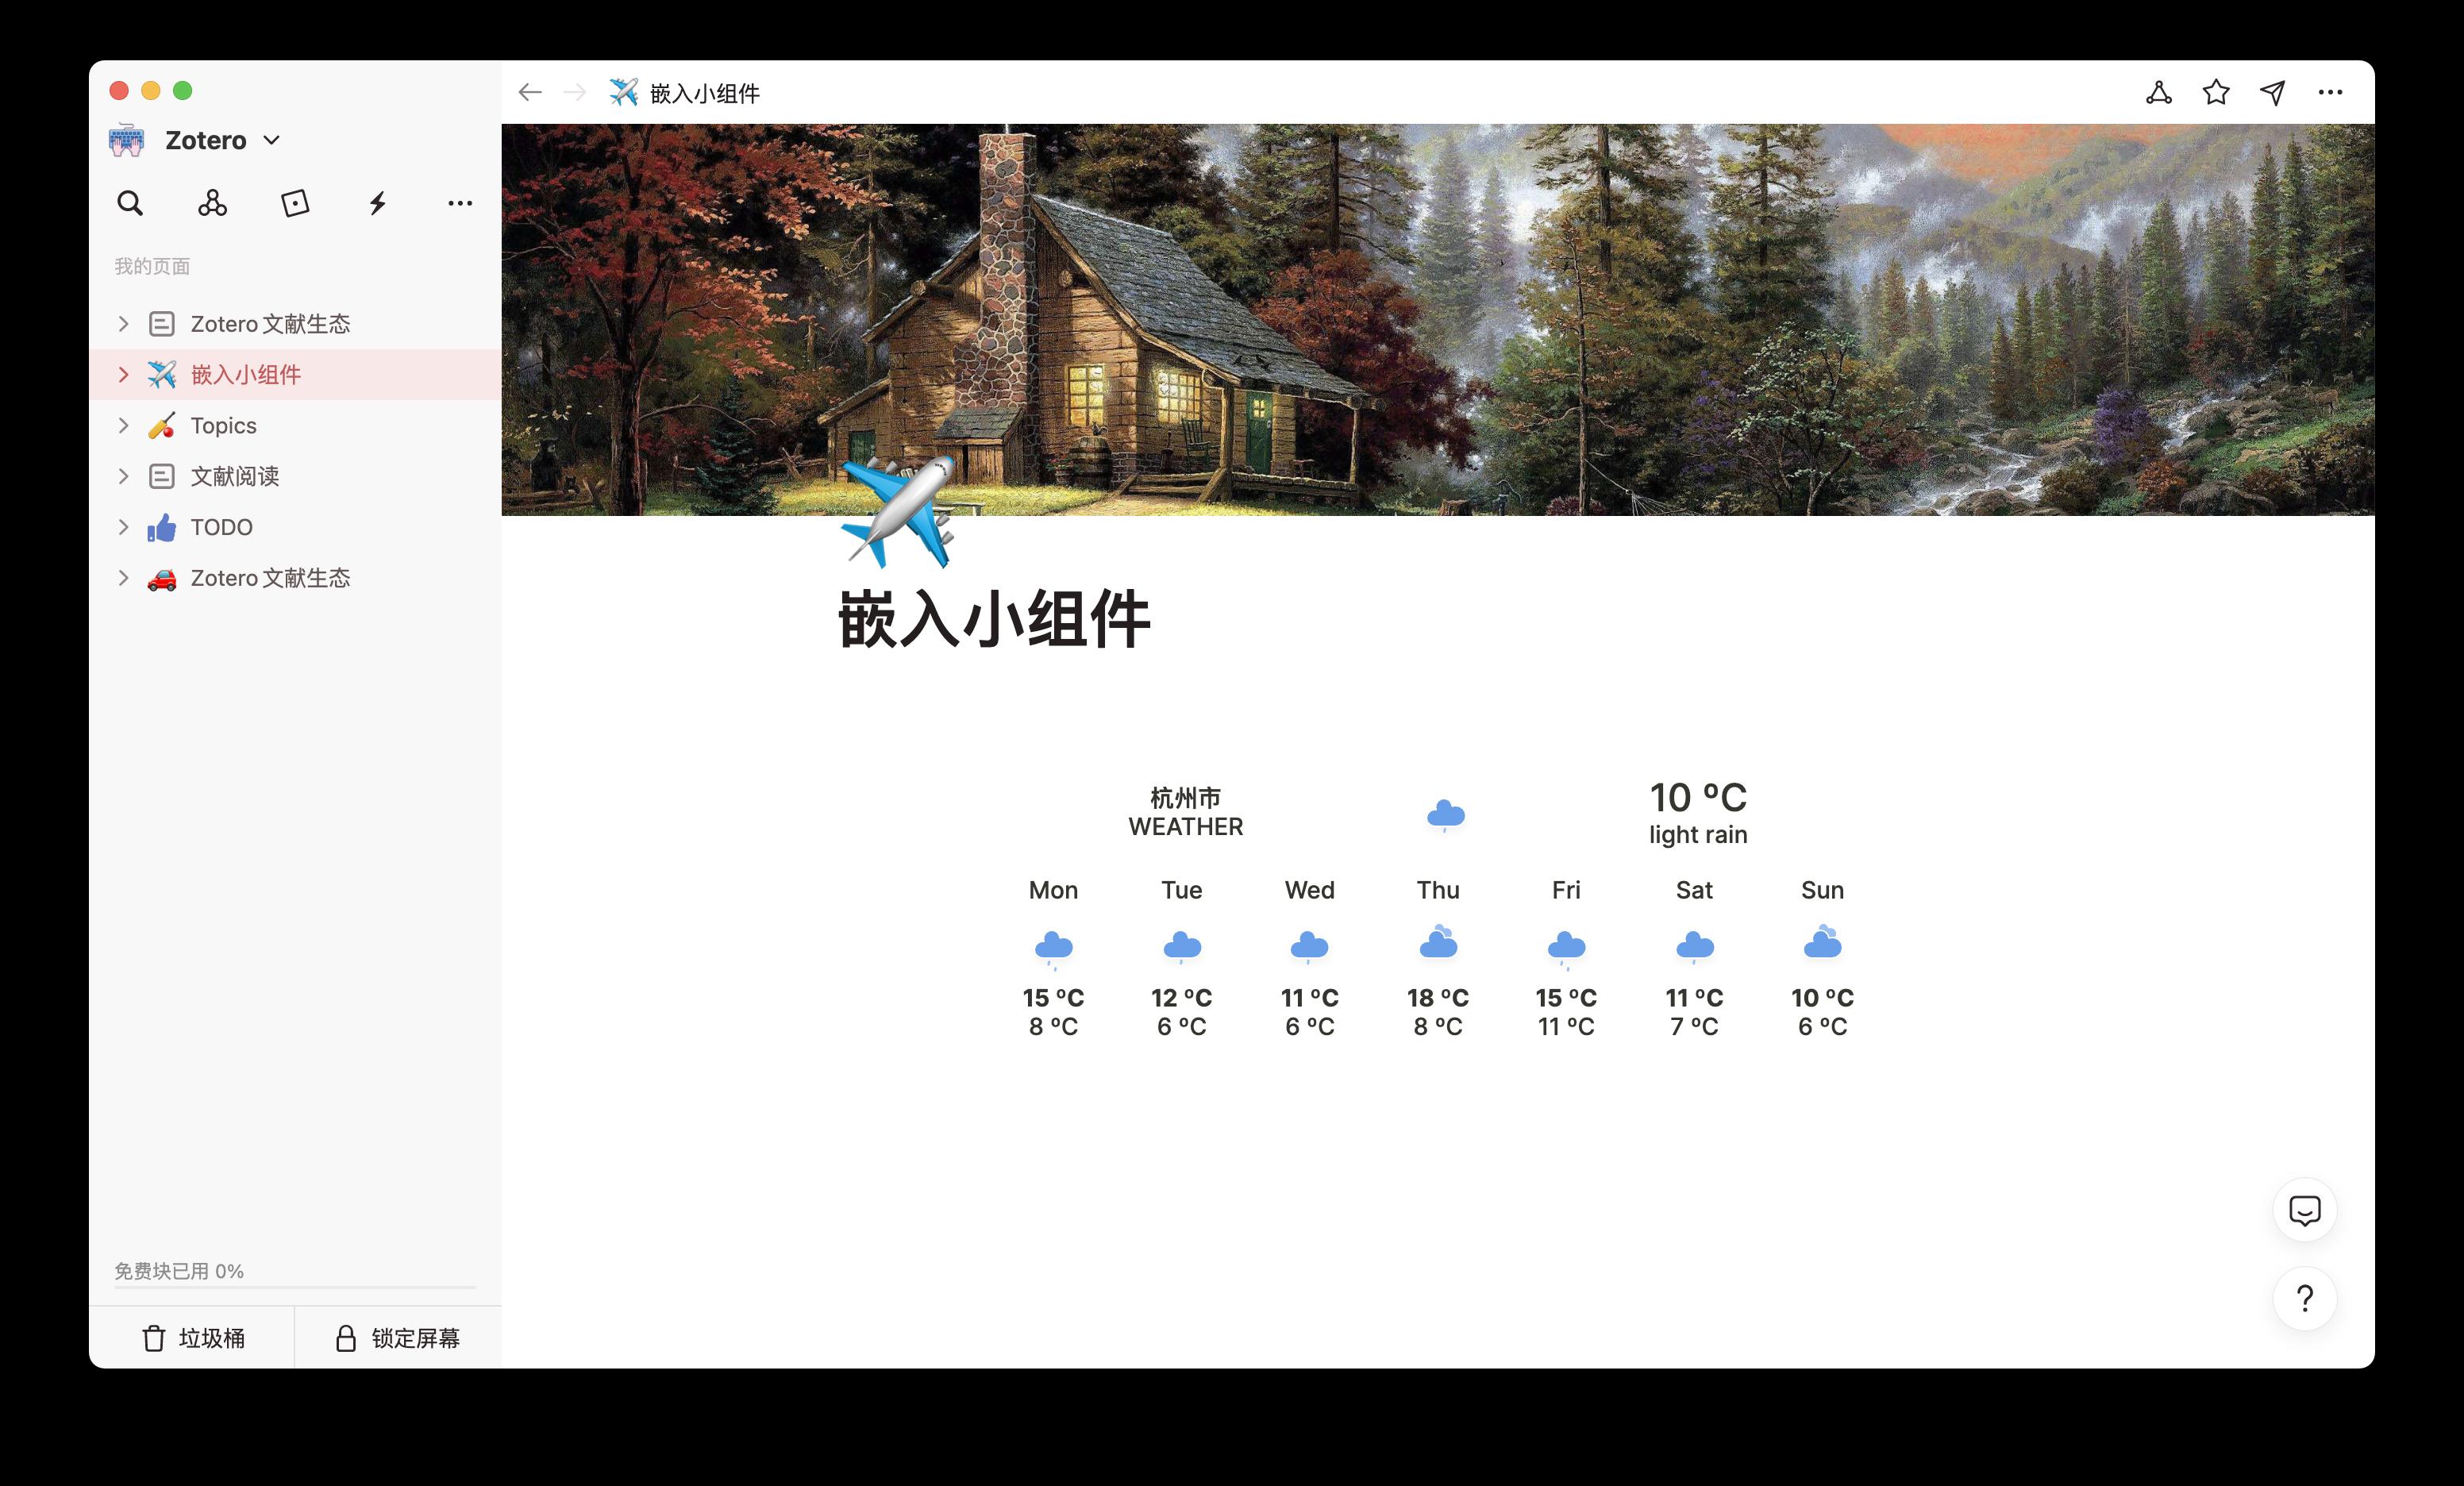 wolai - 嵌入天气☁️小组件